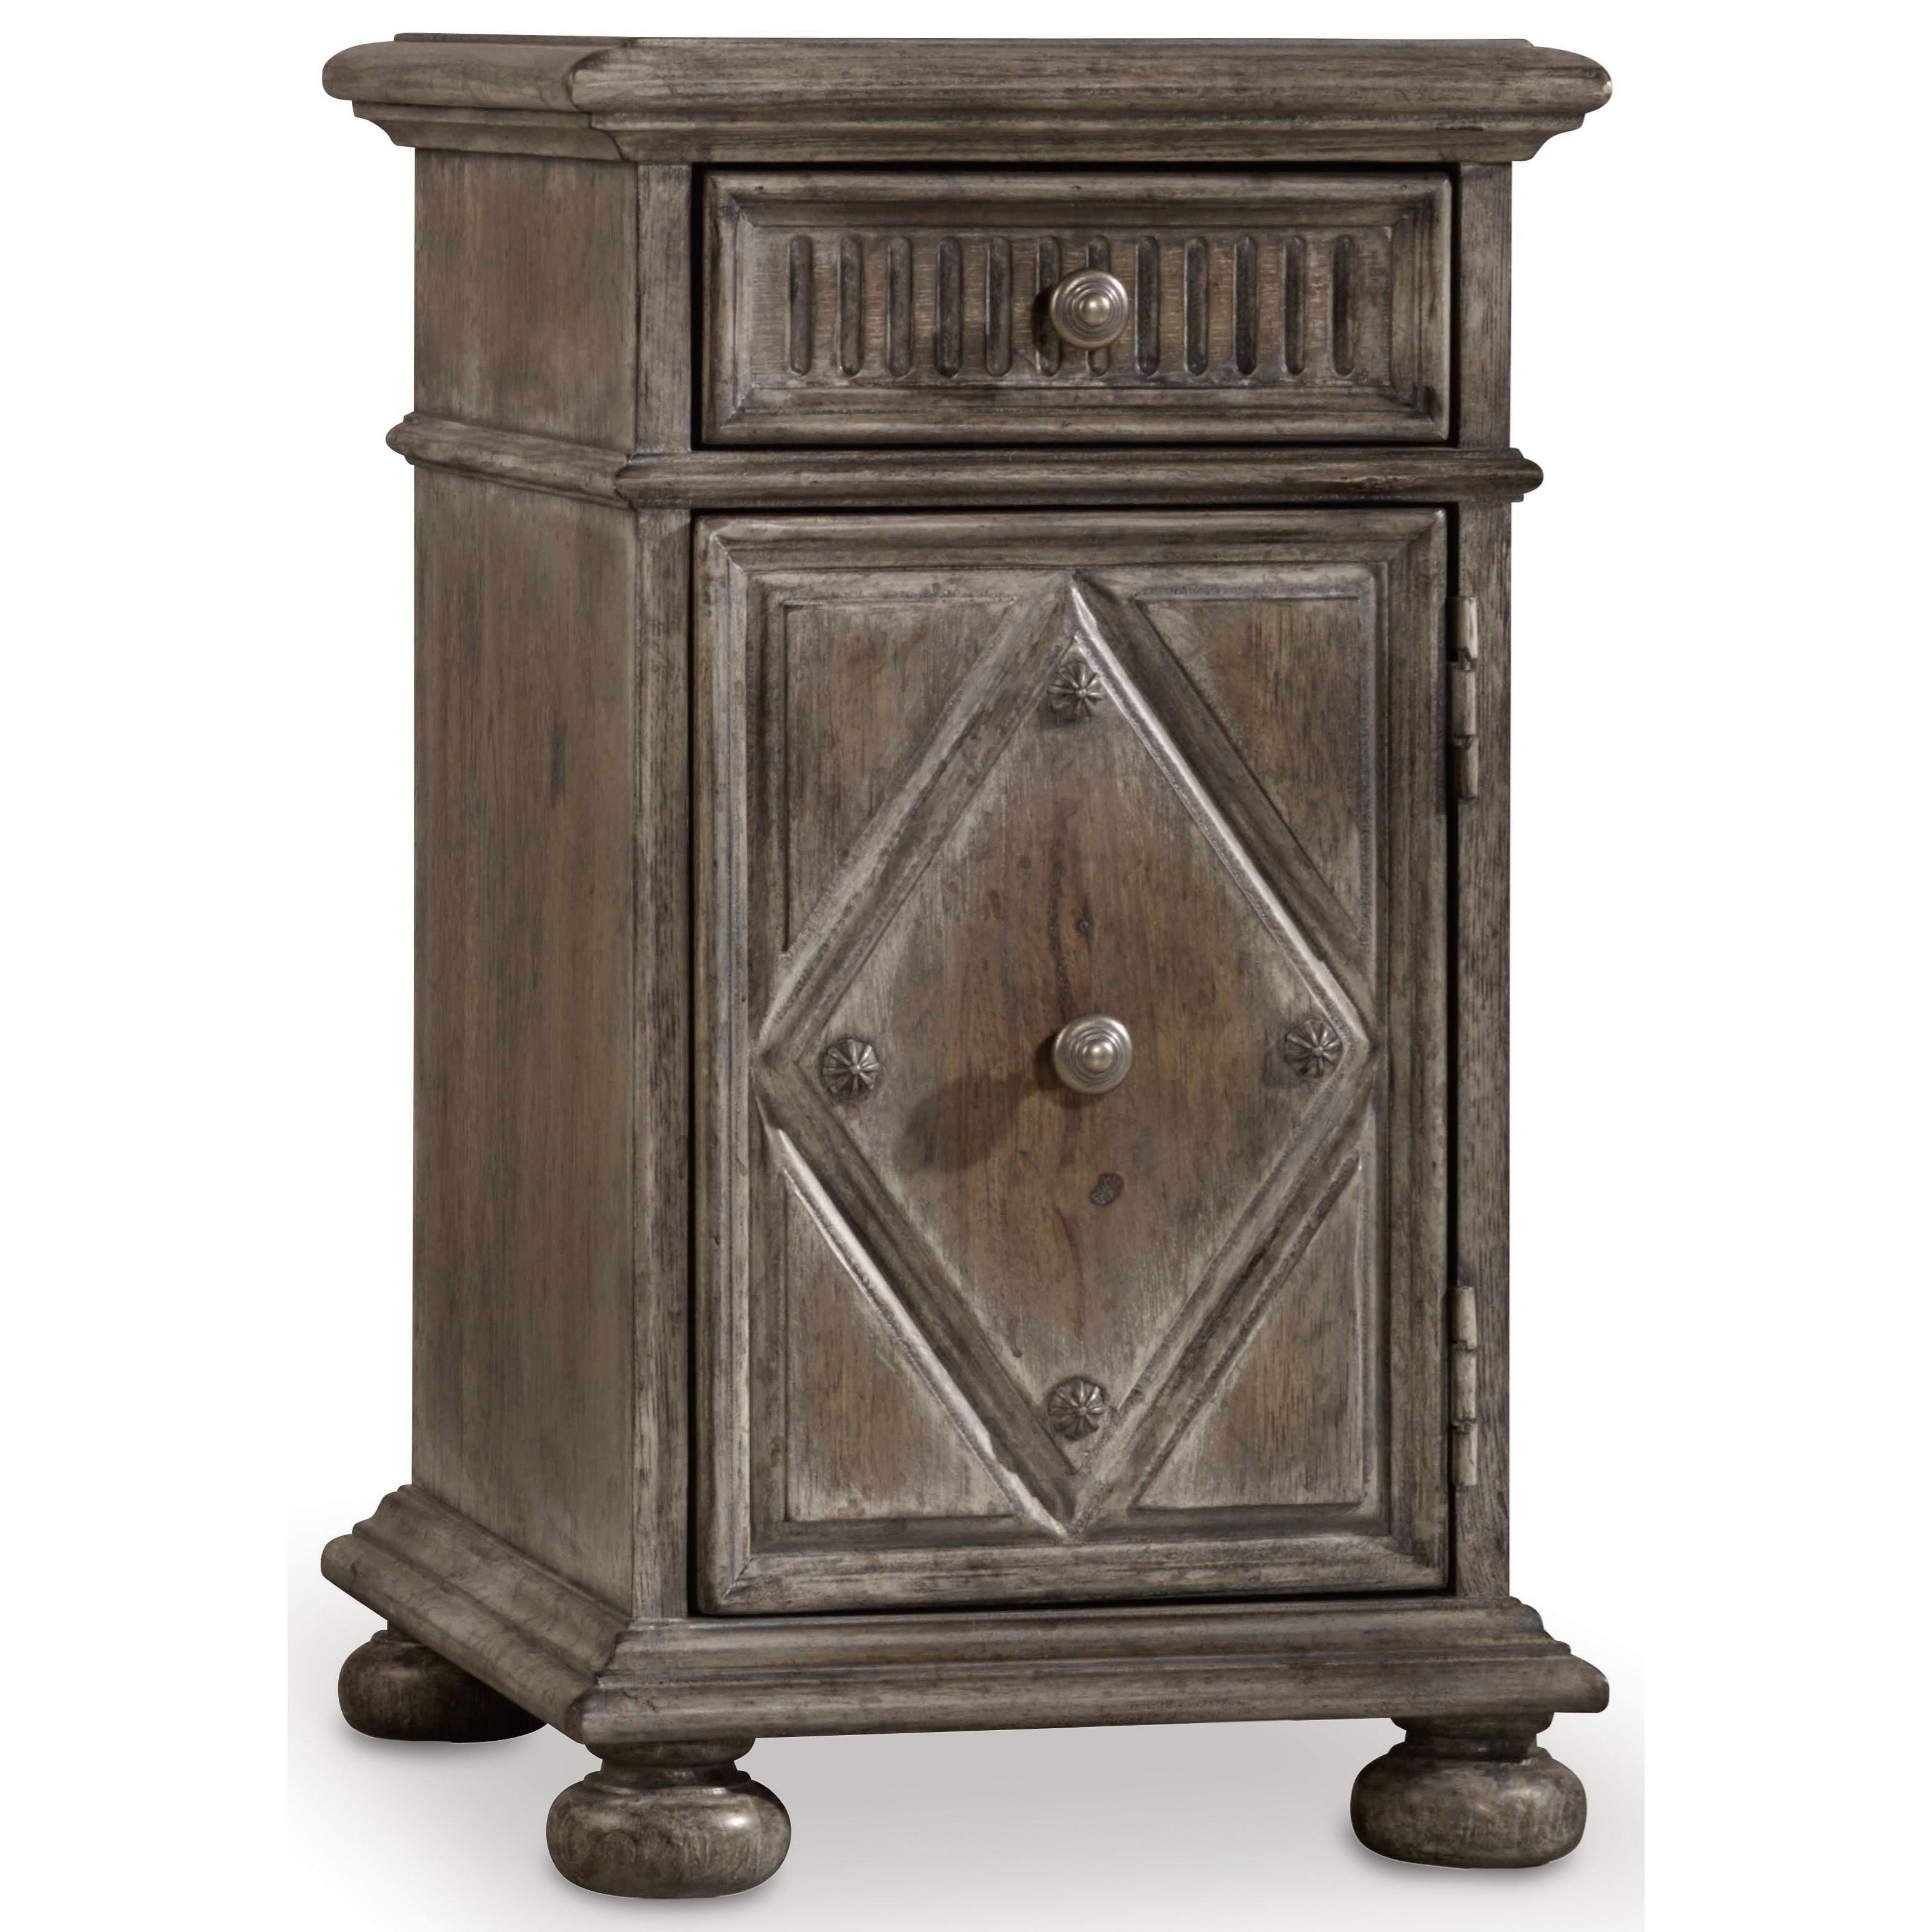 hooker furniture true vintage 5701 80114 chairside table with dovetail drawer dunk bright. Black Bedroom Furniture Sets. Home Design Ideas